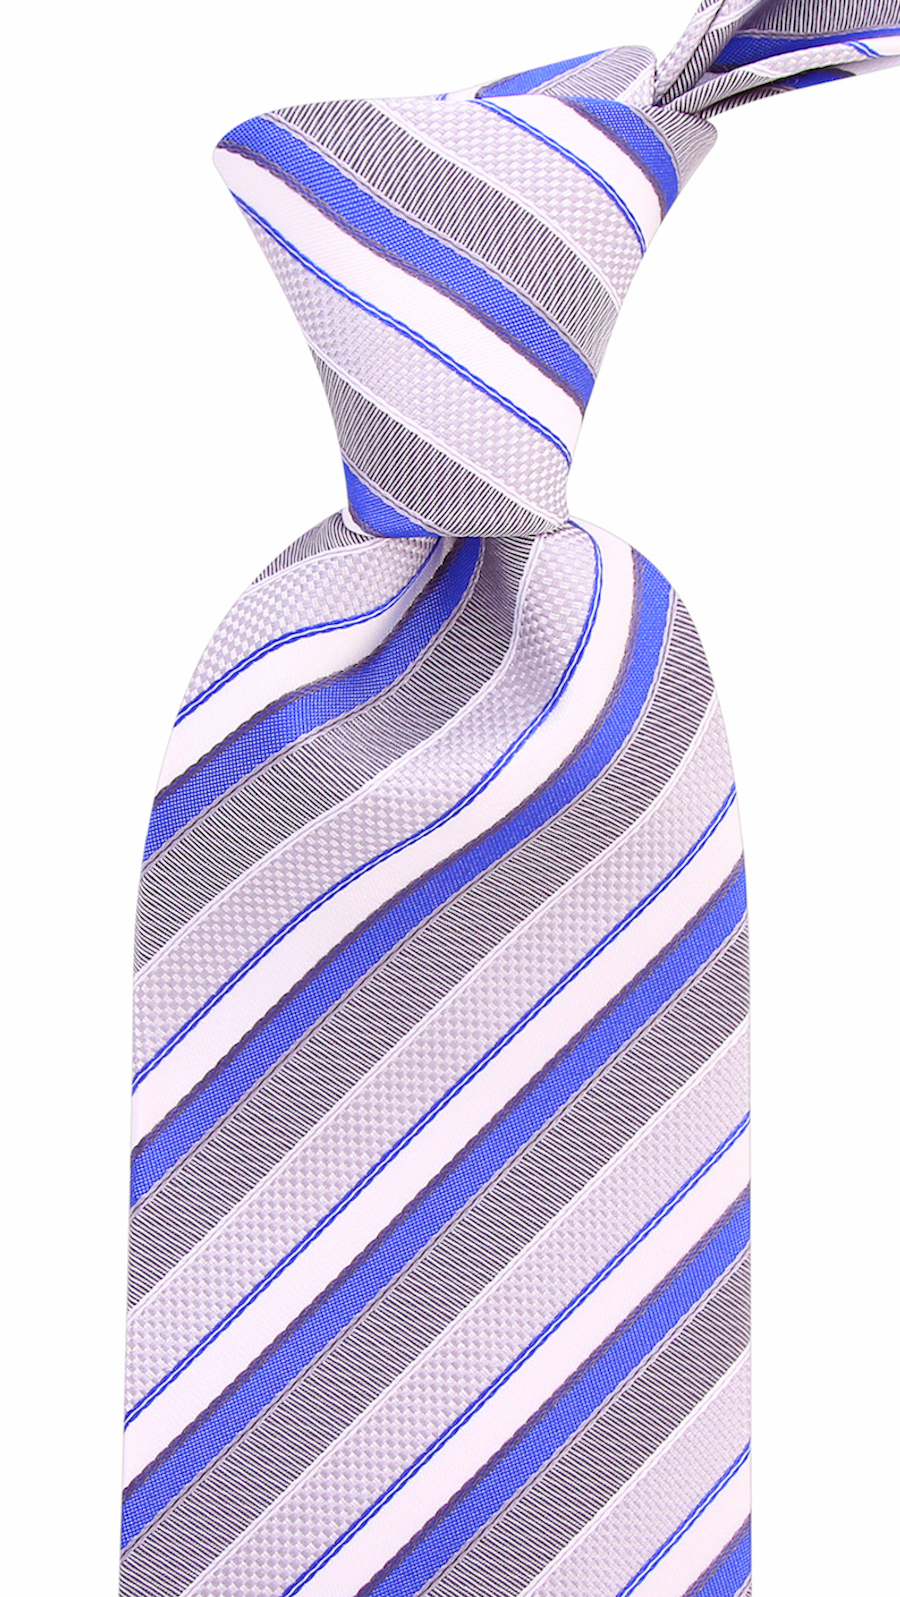 Scott-Allan-Striped-Necktie-Mens-Ties-in-Various-Colors thumbnail 30